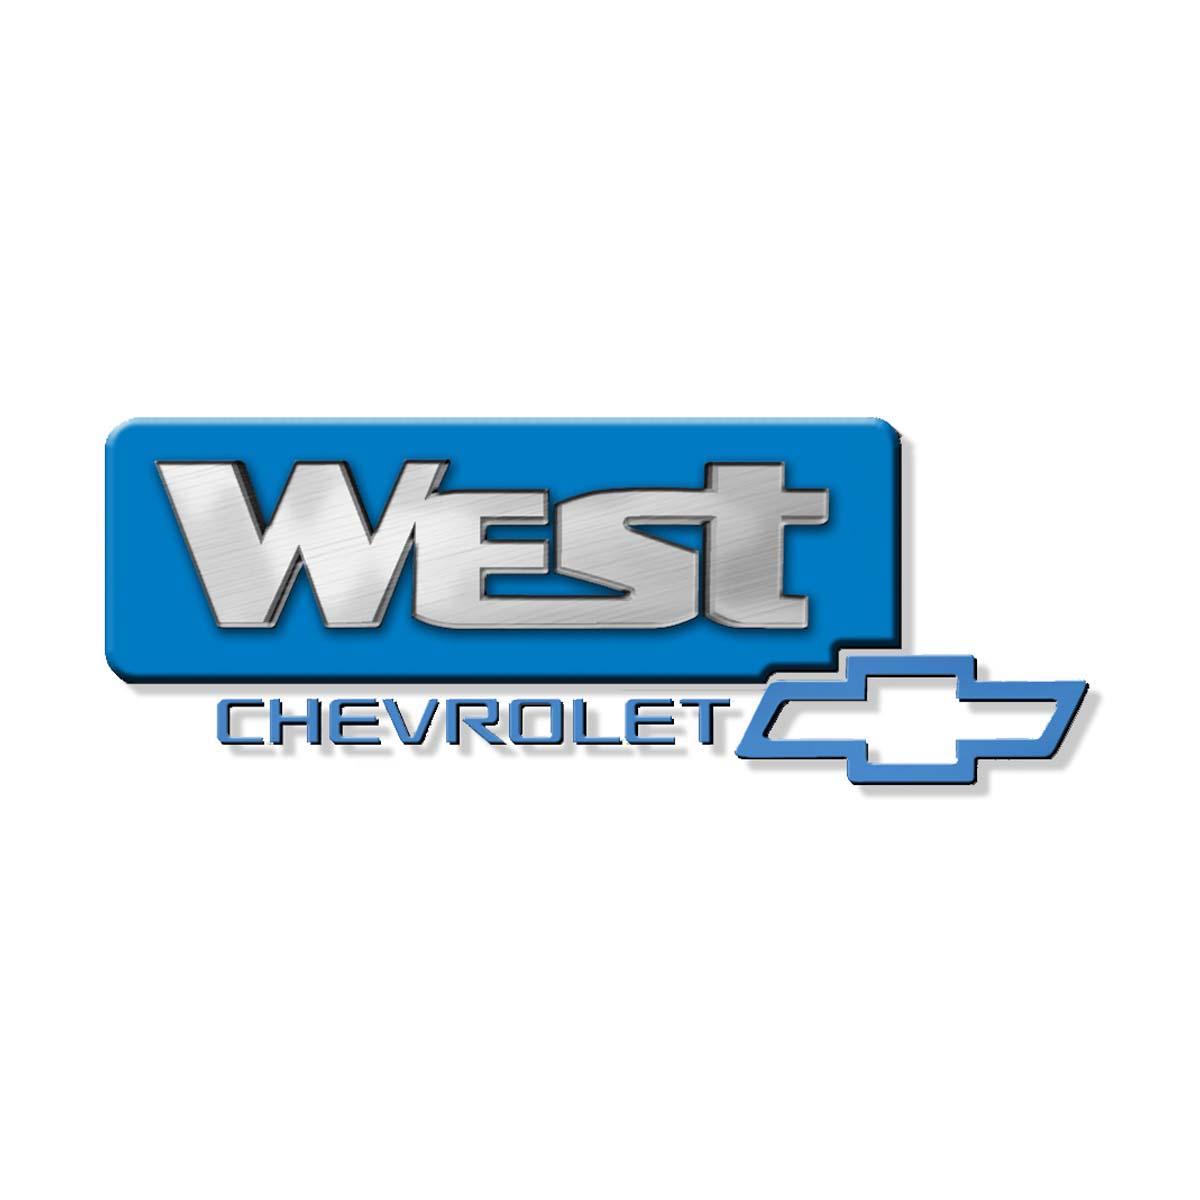 Smoky Mountain Chevrolet >> West Chevrolet Smoky Mountain Air Show